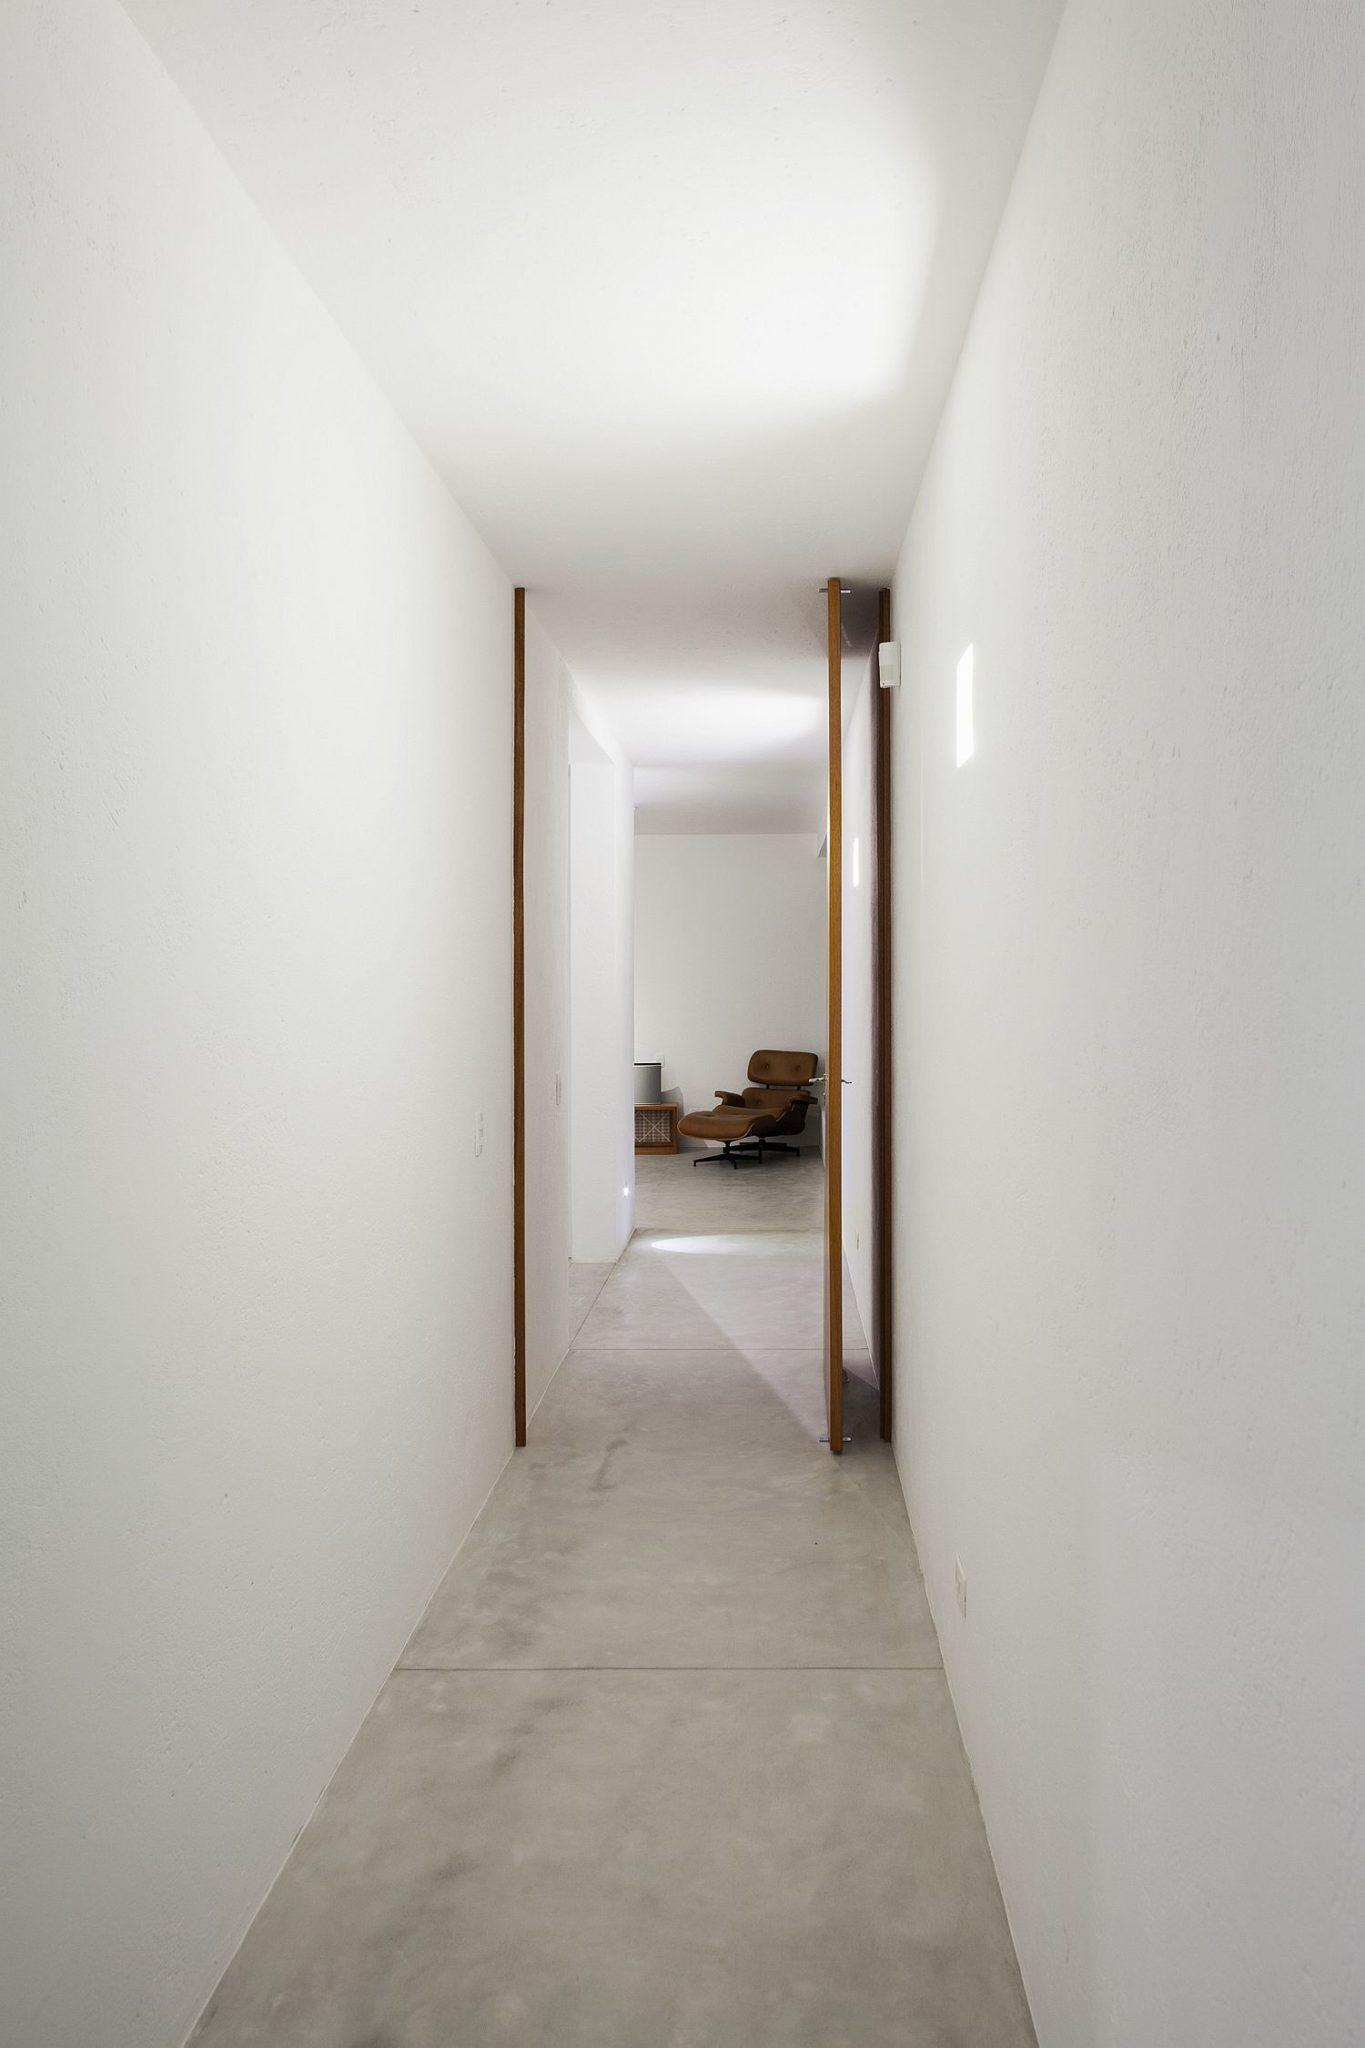 White and narrow corridor of the Brazilian home